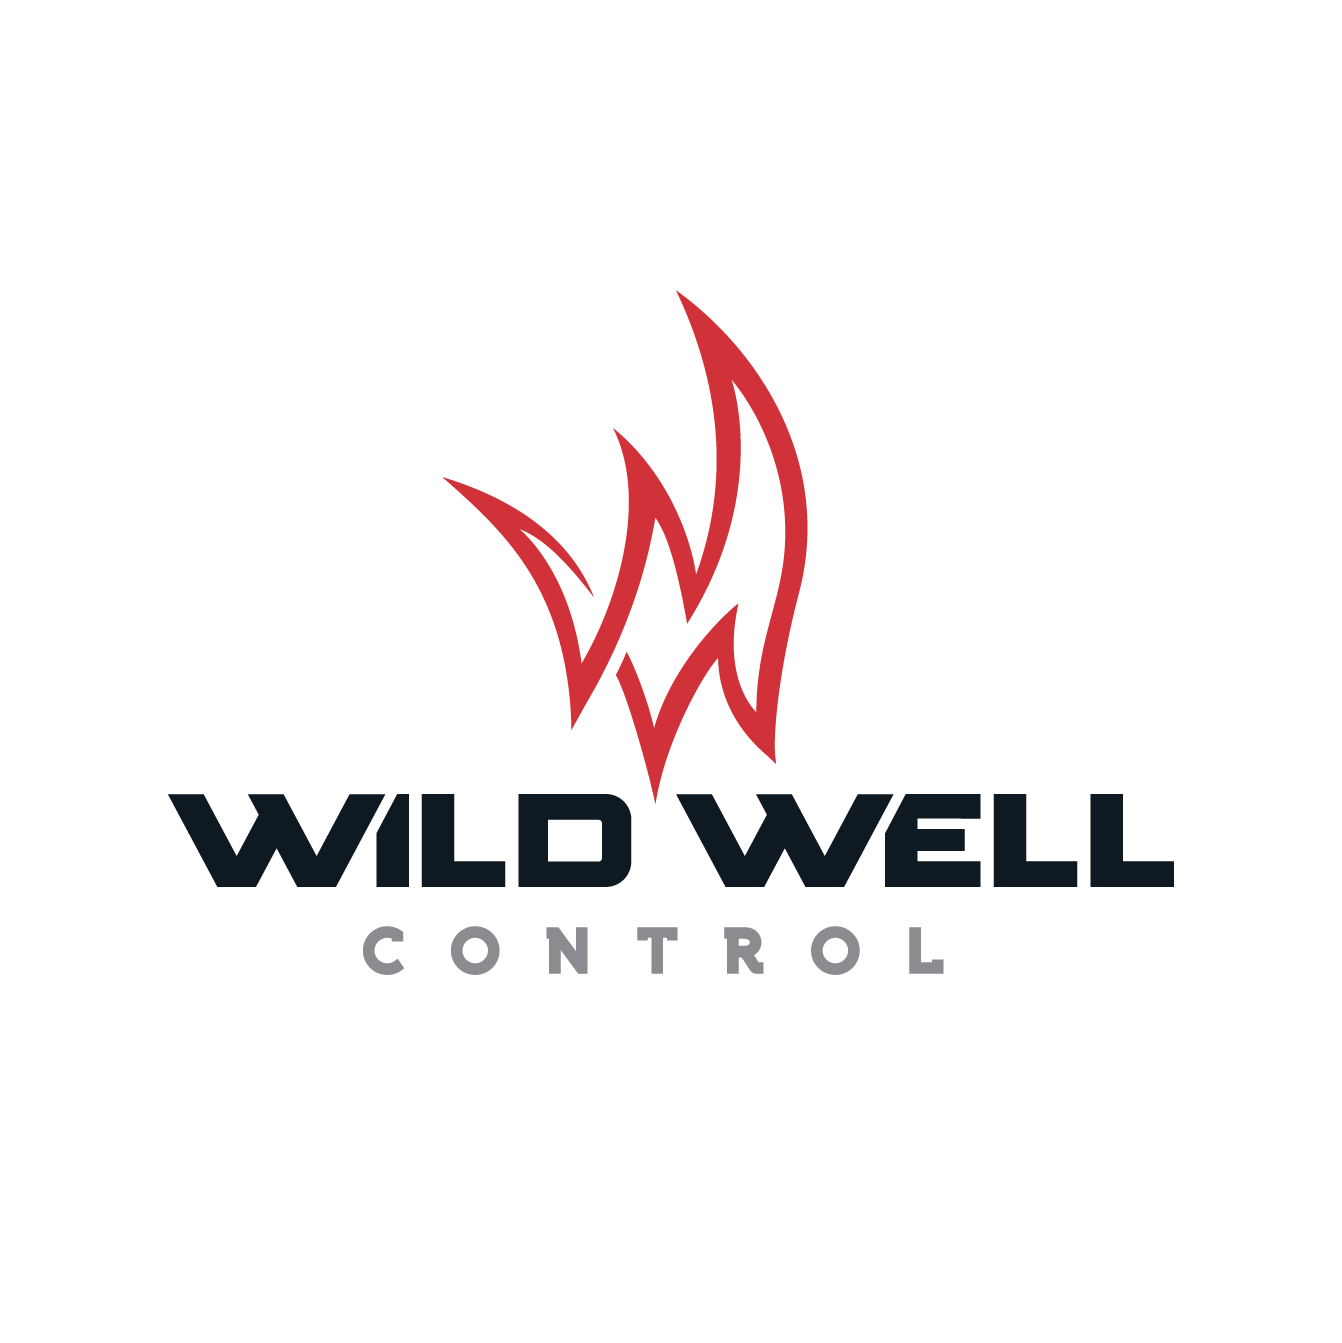 Wild Well Control Inc.